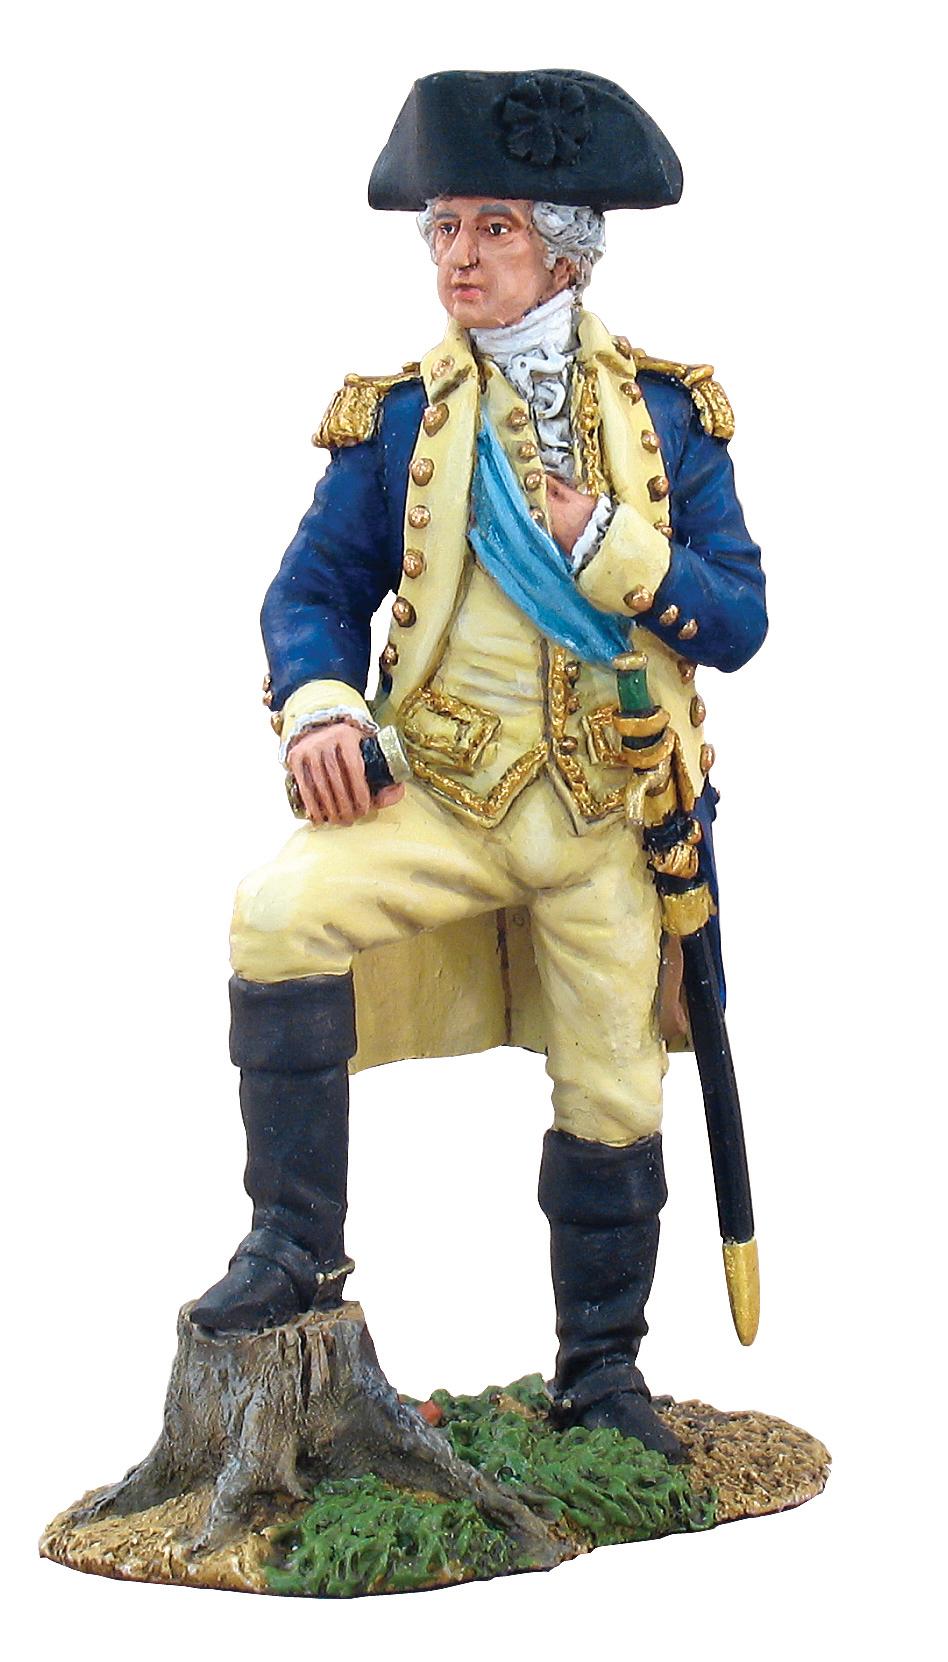 Revolution clipart french soldier Revolutionary Toy Revolutionary War War